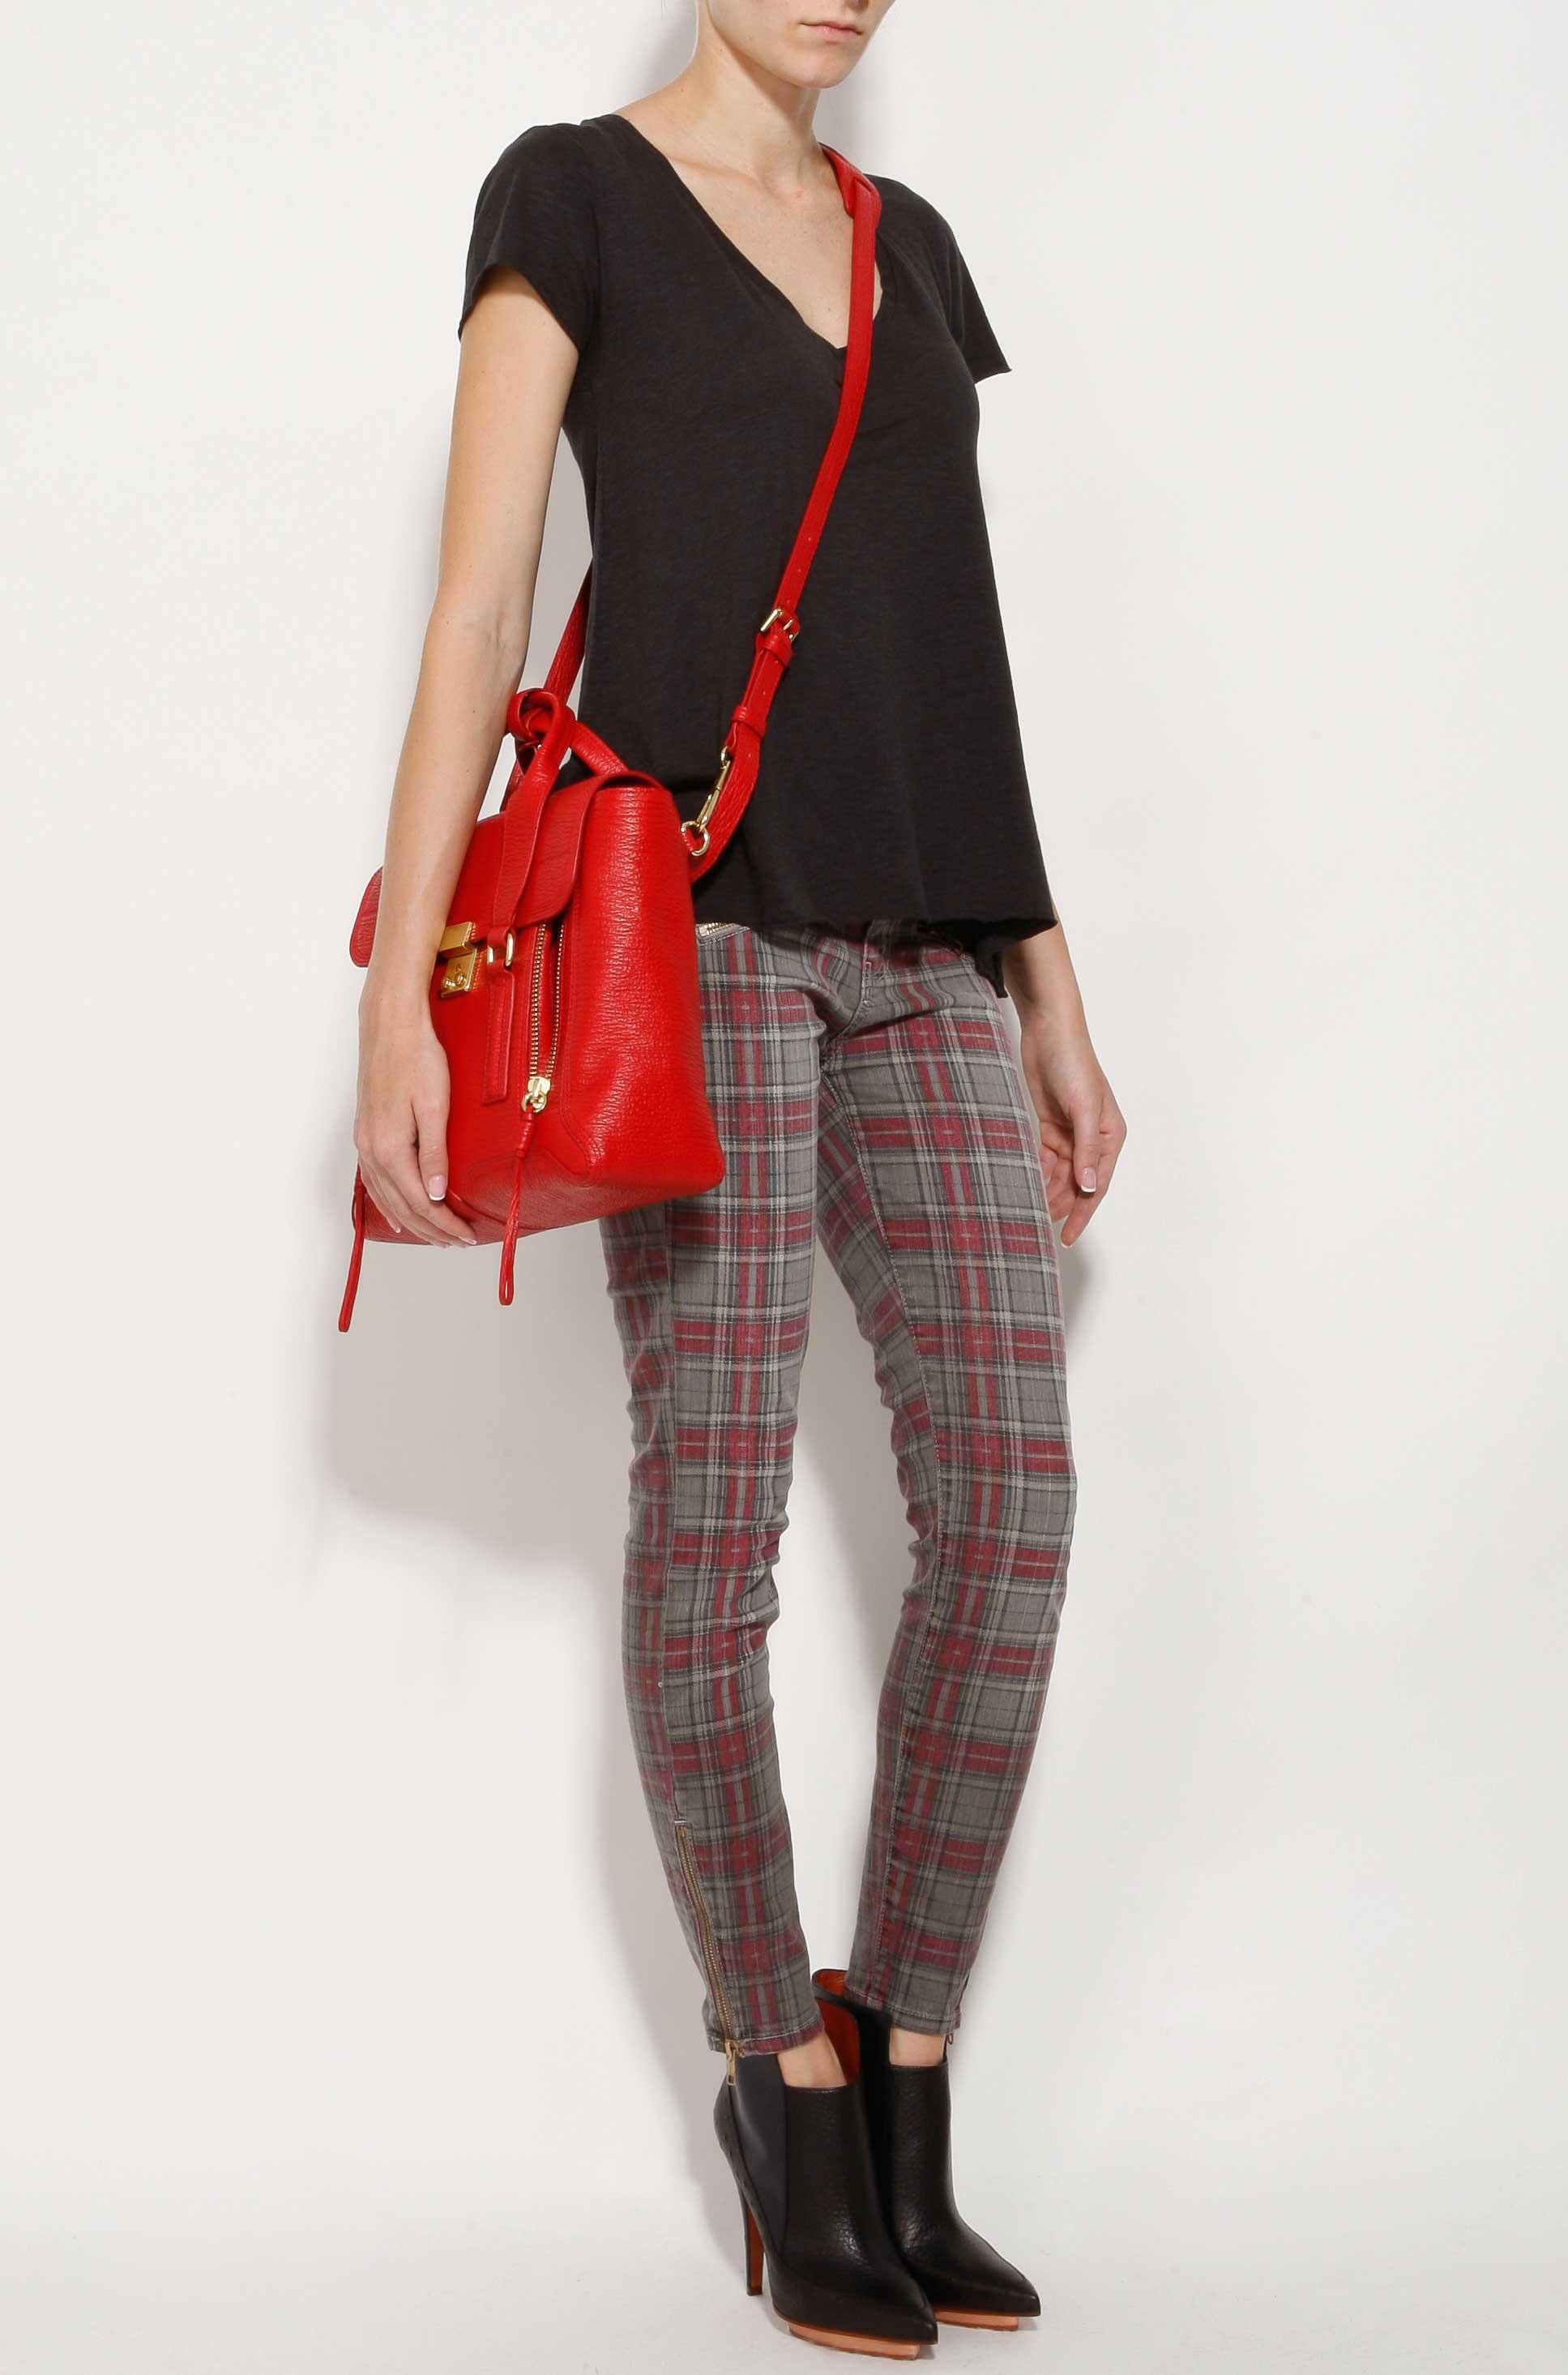 mini Pashli satchel - Red 3.1 Phillip Lim ALM6RYXZ